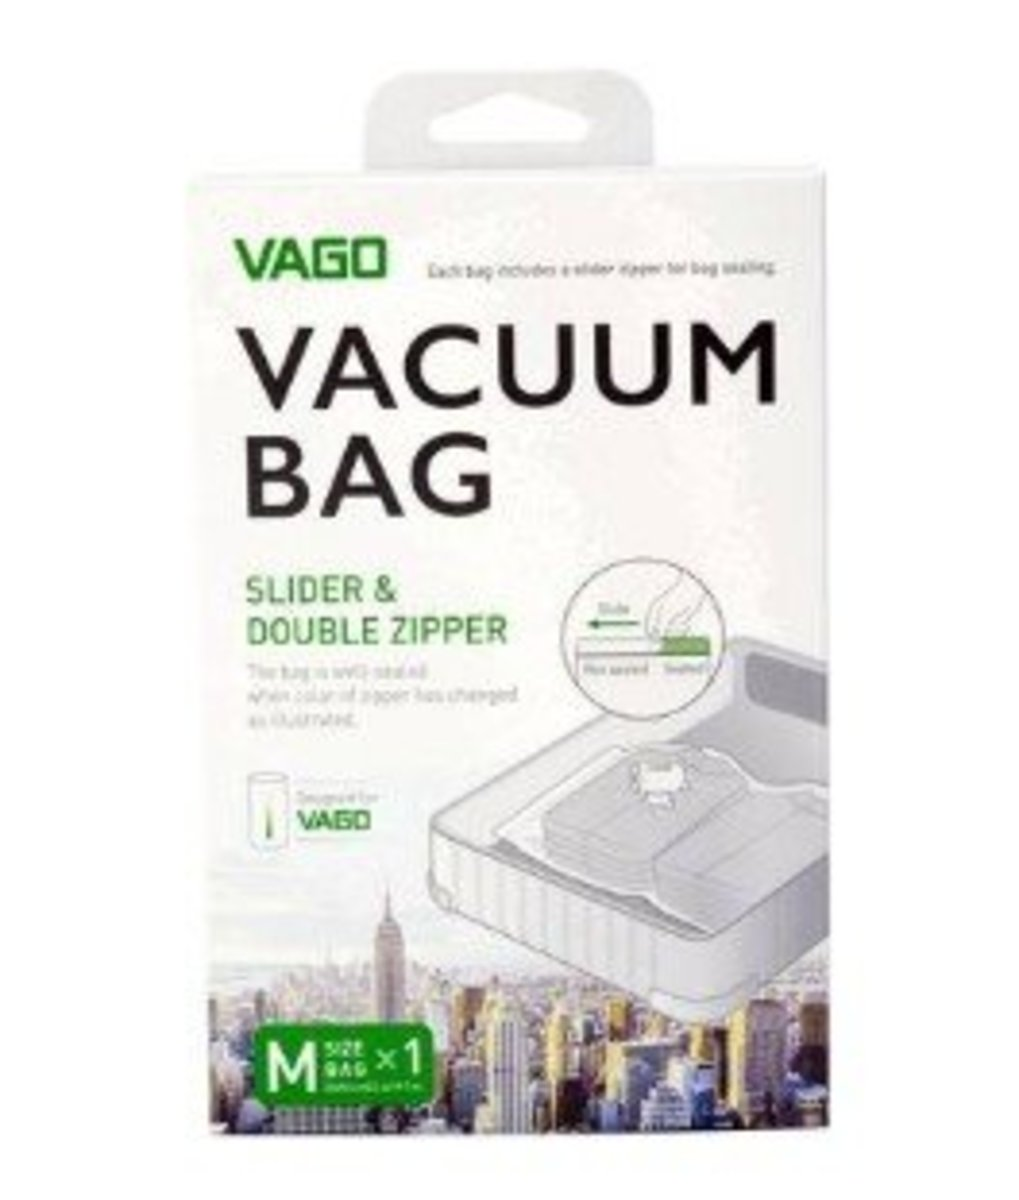 【M size 】Storage Vacuum Bag (For Vago Portable Compressor)